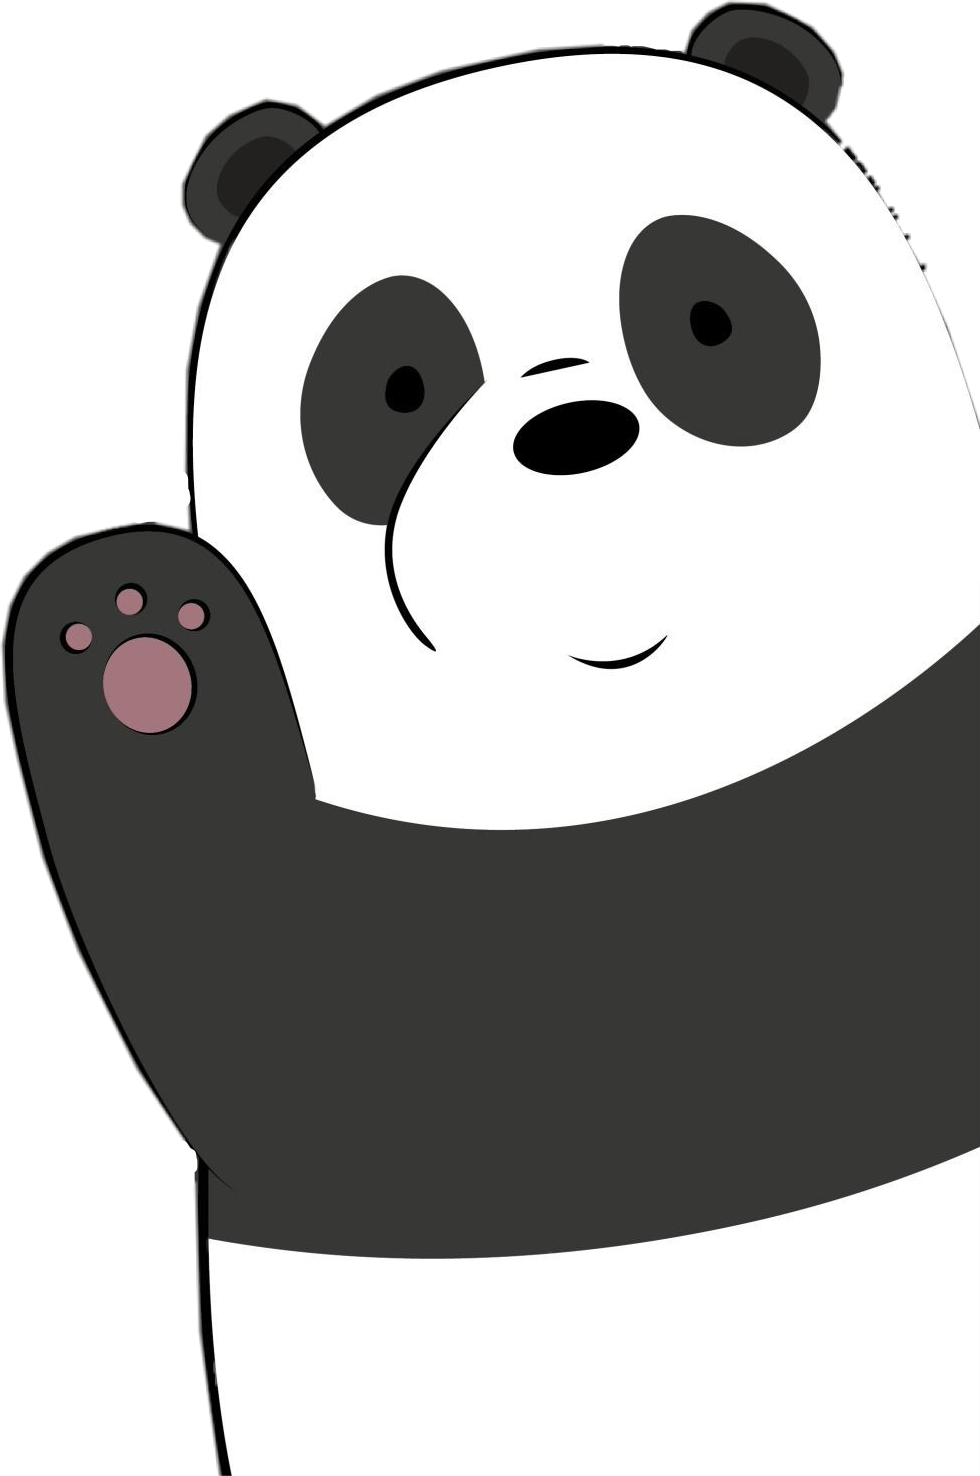 View Full Size Panda Clipart We Bare Bears We Bare Bears Panda Png Transparent Png And Download Transparent Clipart For Bare Bears We Bare Bears Panda Bear